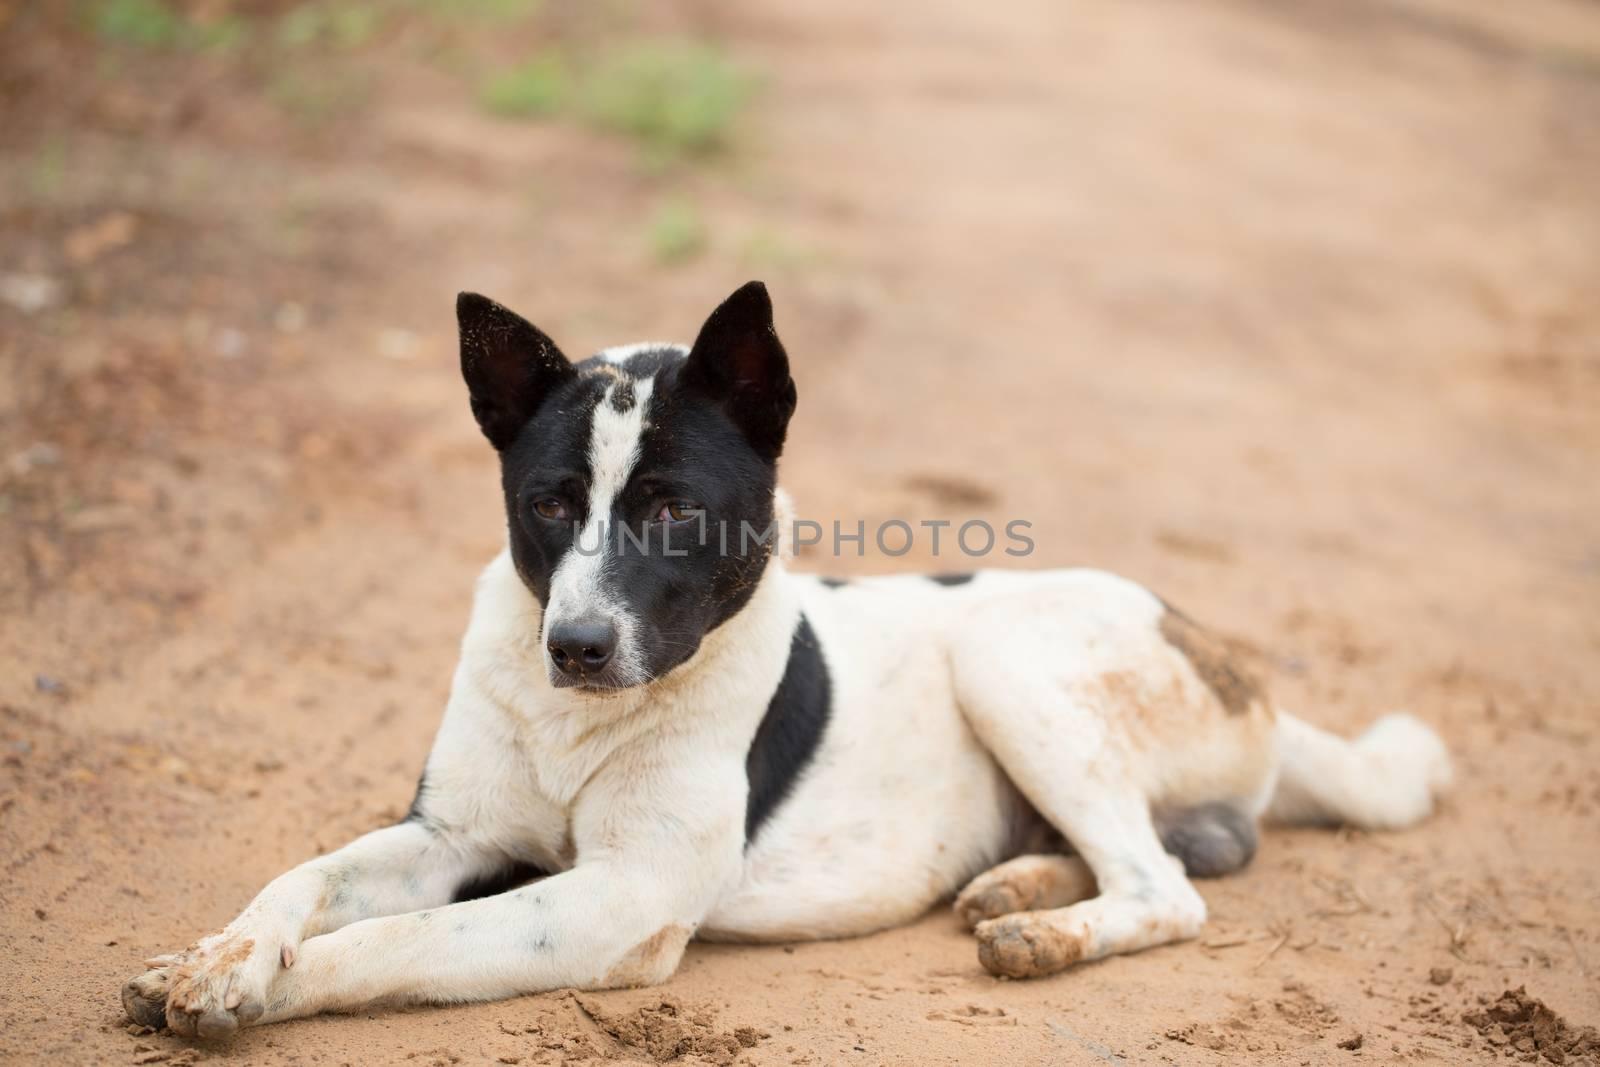 Roadside dog waiting with hope.